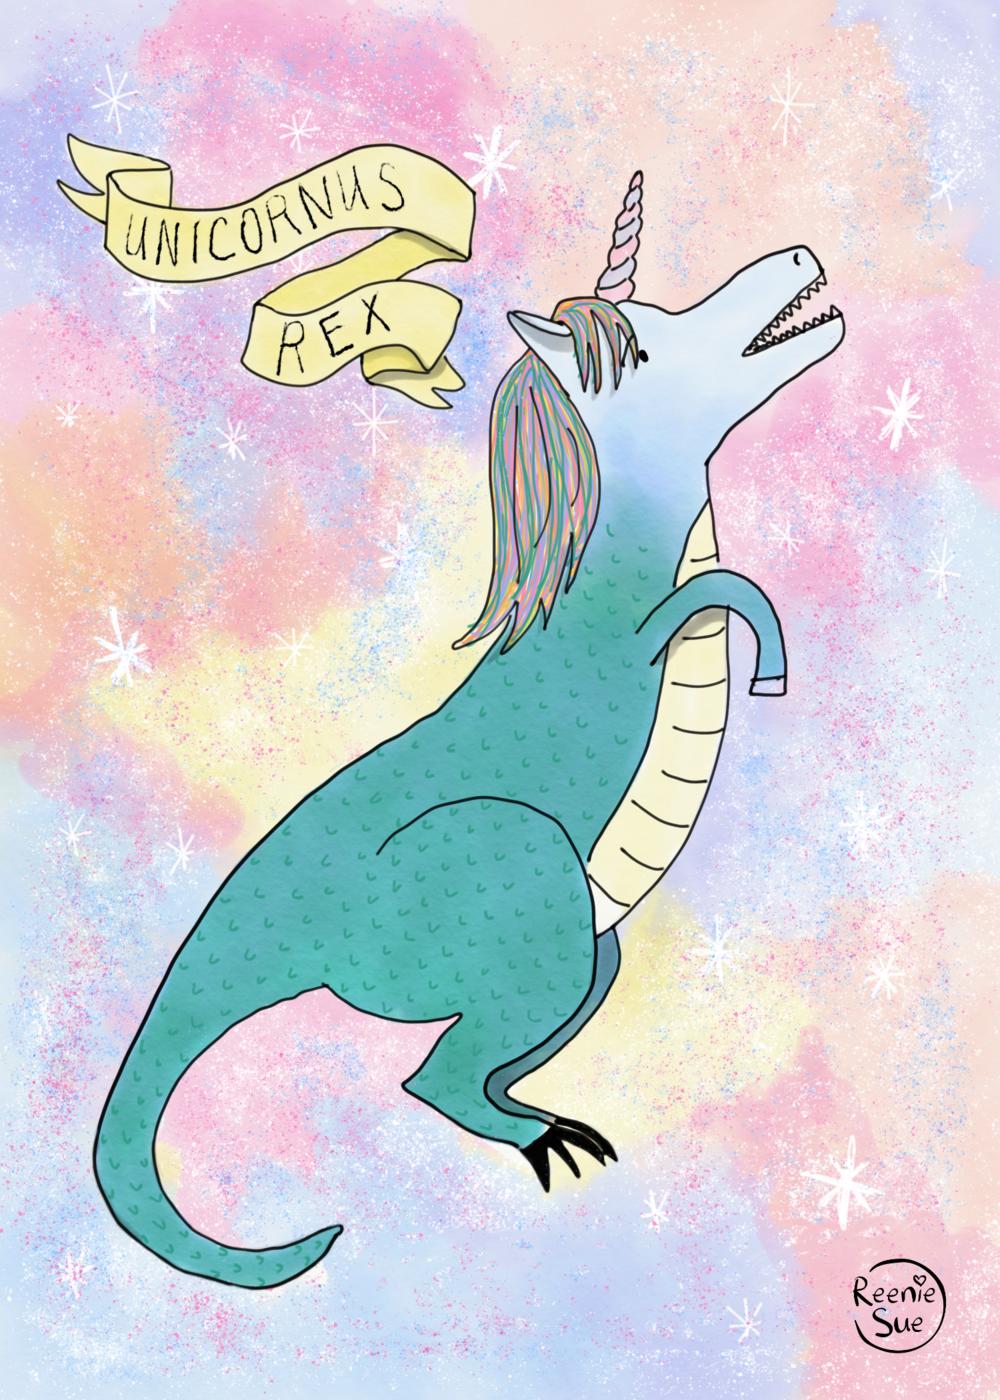 """Unicornus Rex"" digital illustration"